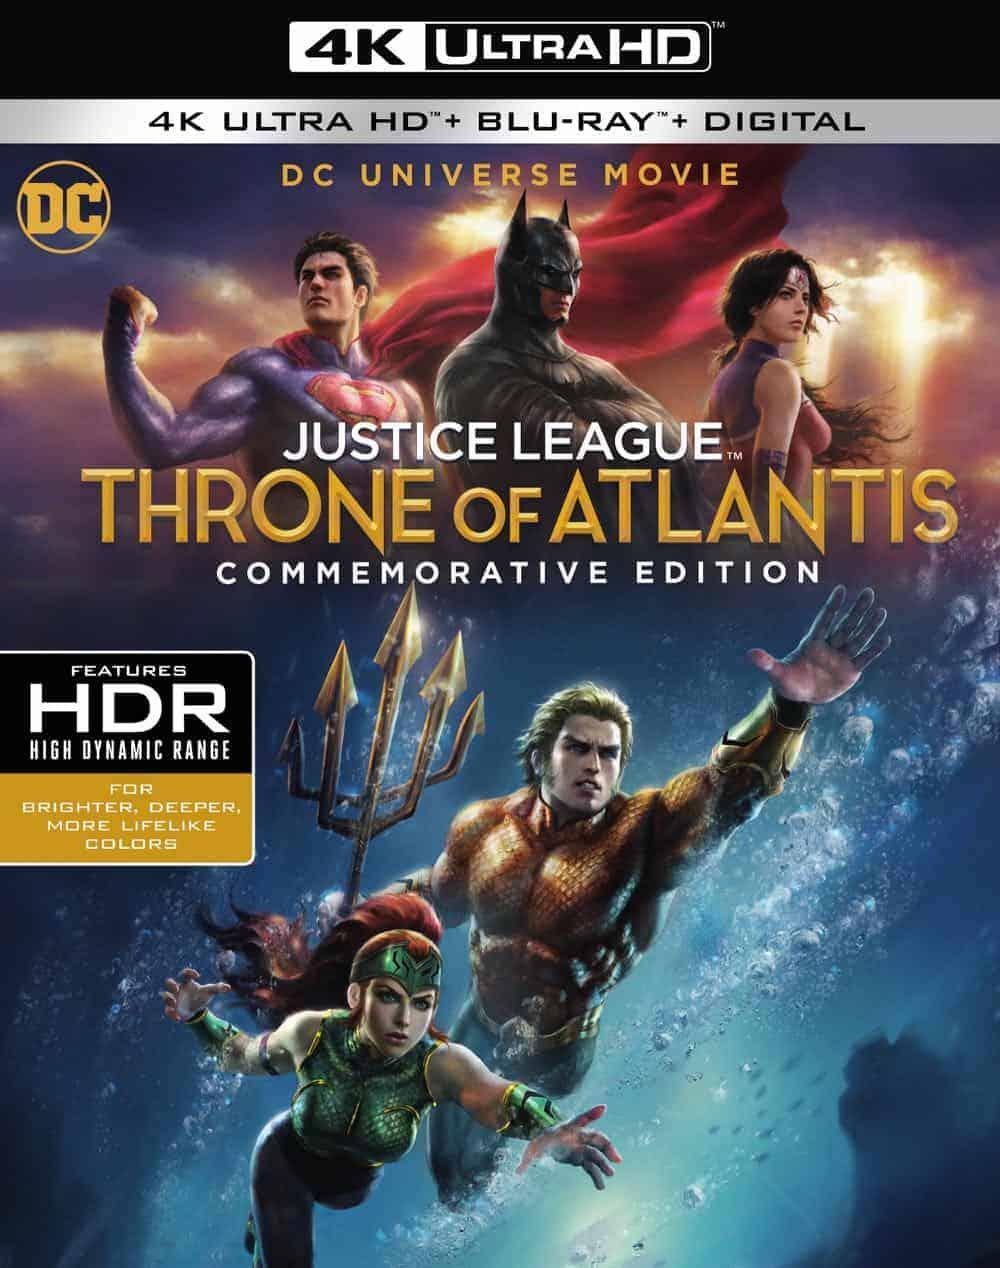 JUSTICE LEAGUE: THRONE OF ATLANTIS Commemorative Edition 4K